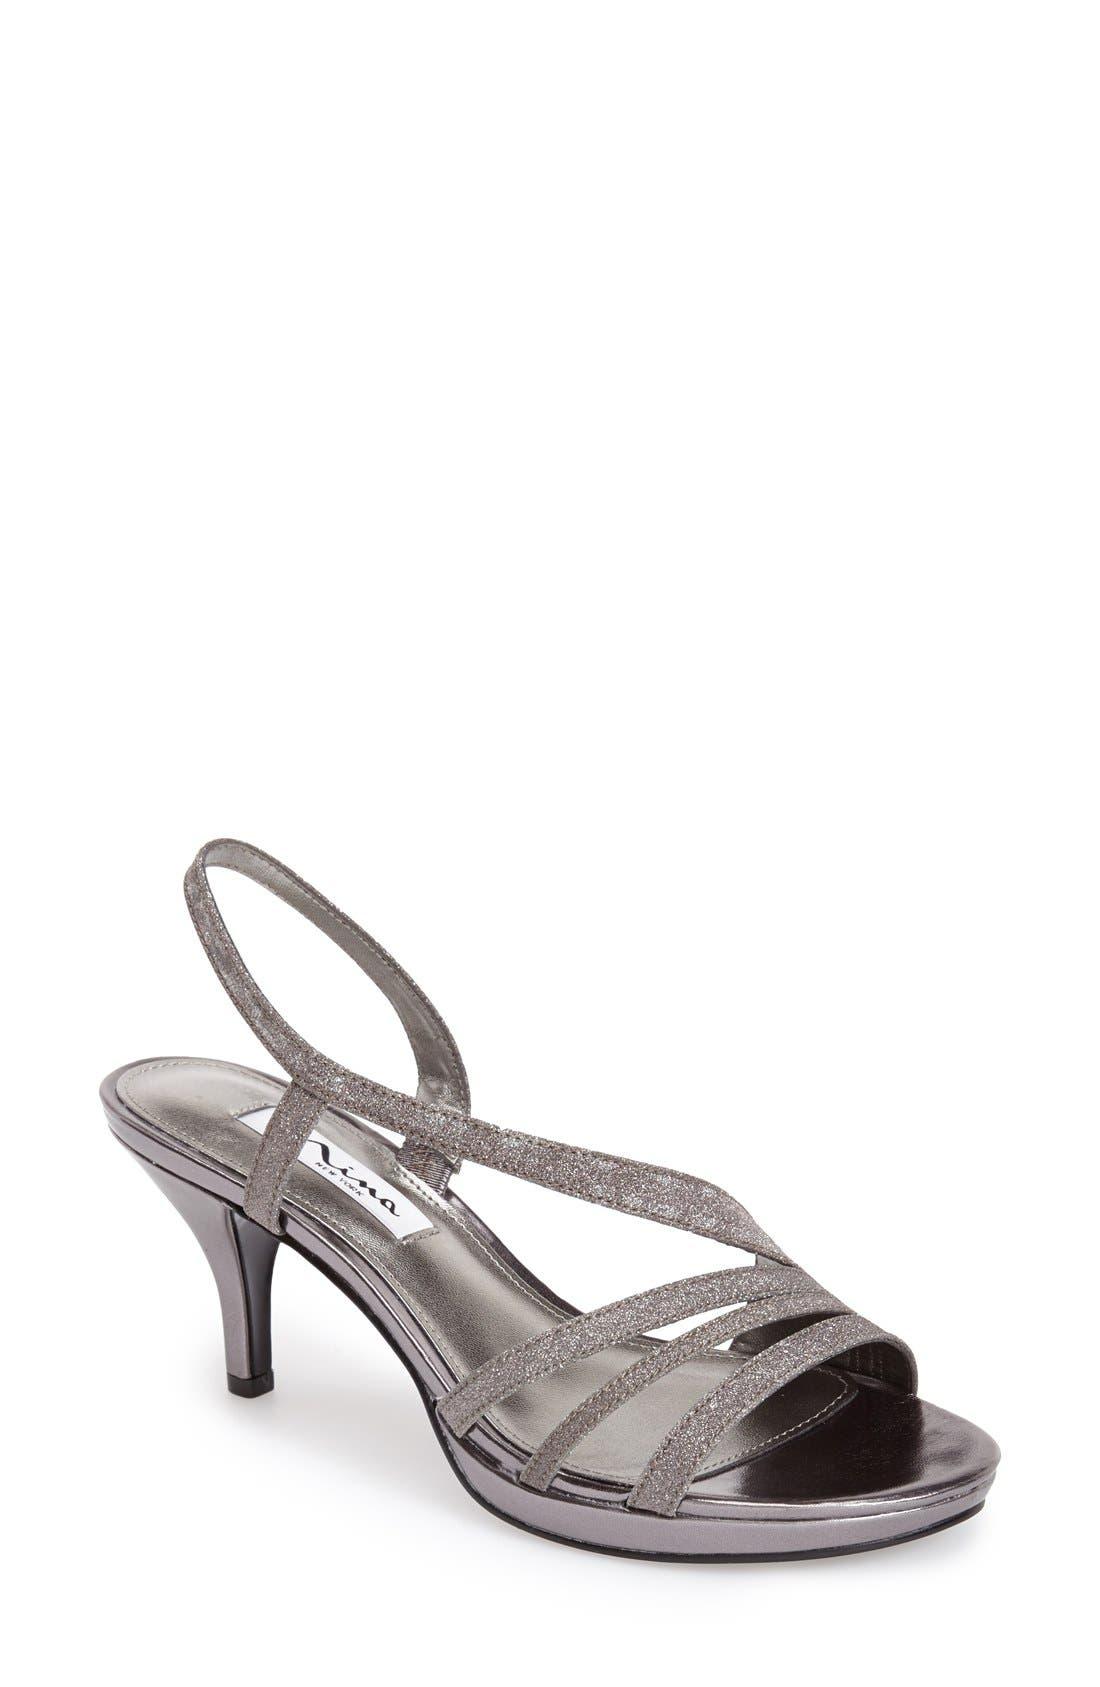 'Neely' Slingback Platform Sandal,                         Main,                         color, CHARCOAL